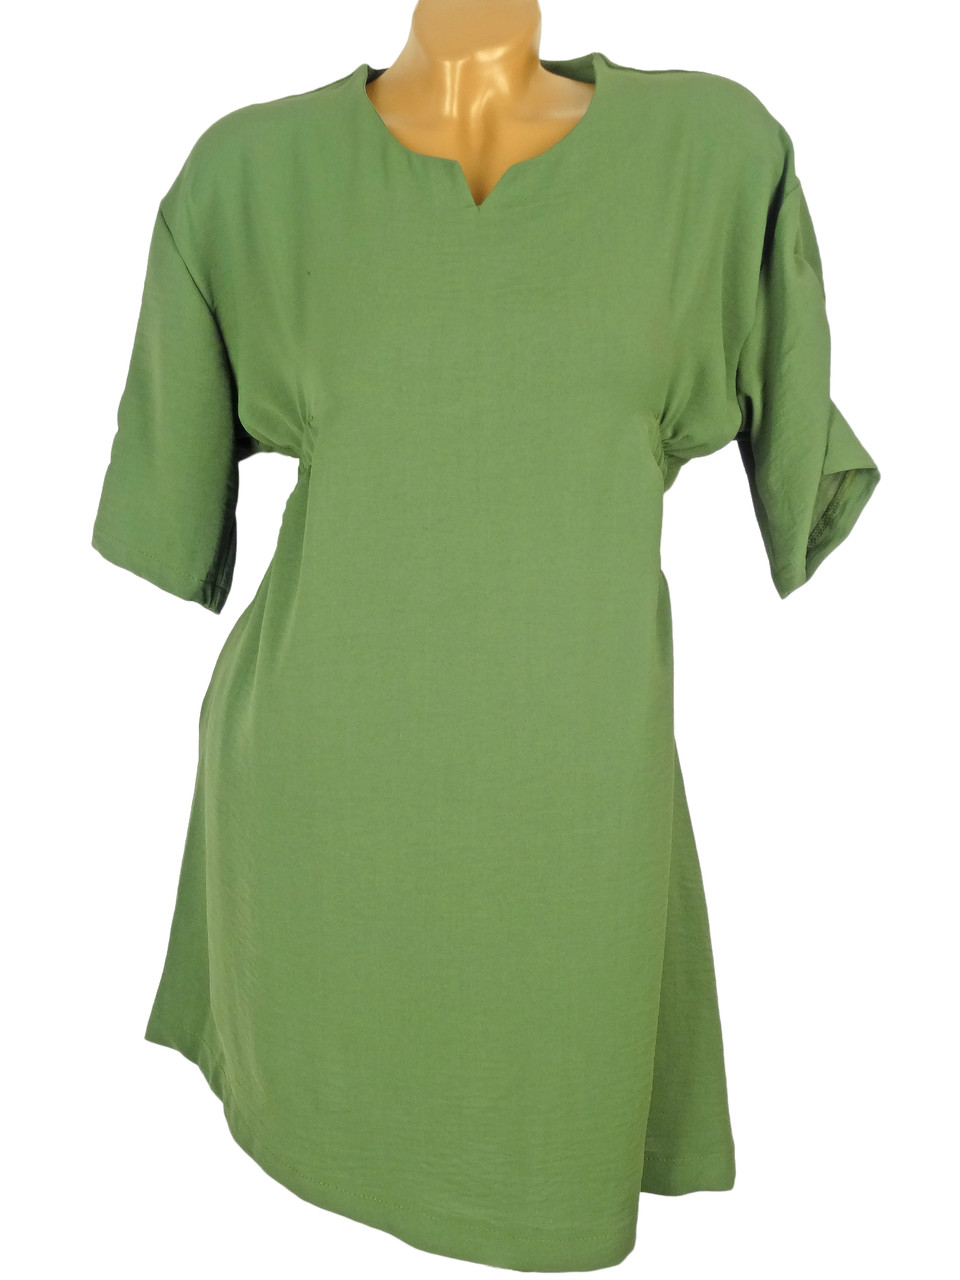 Удобная батальная платье-туника (в расцветках)